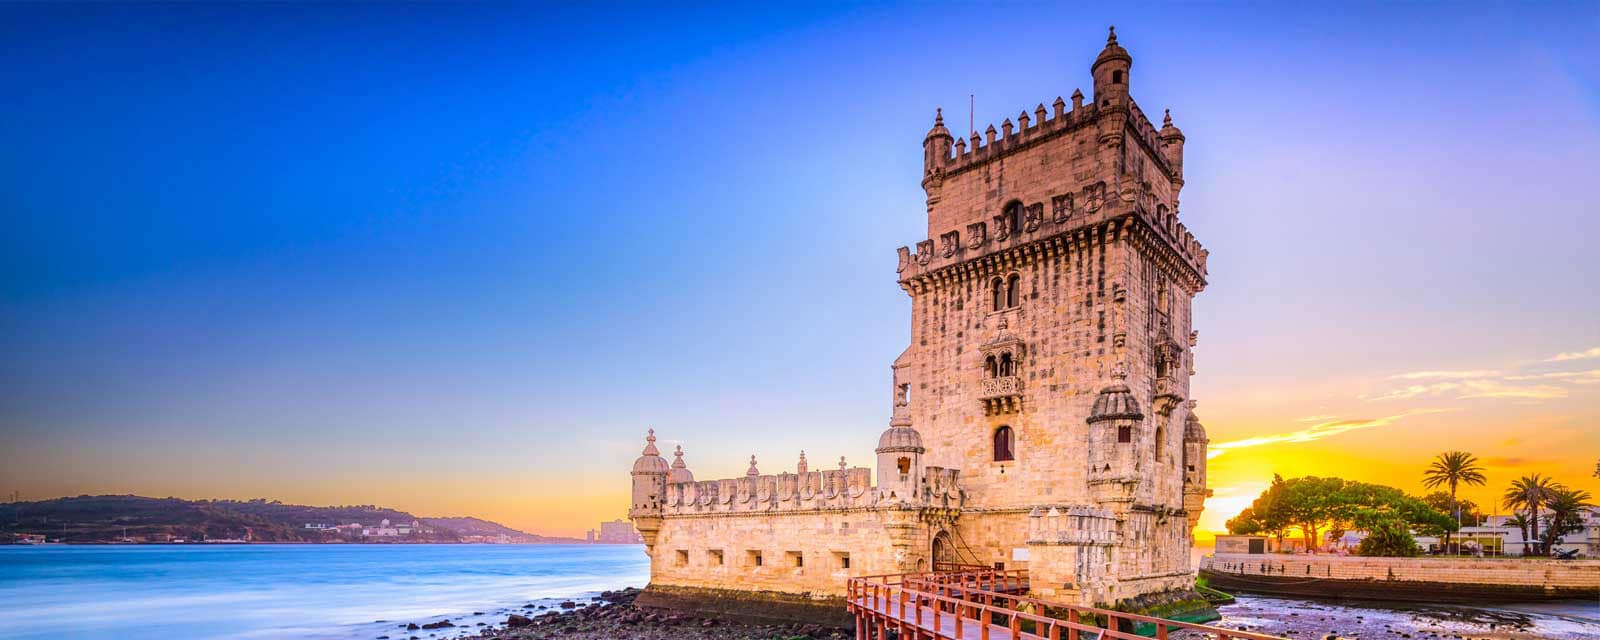 Belém Tower Lisbon Portugual